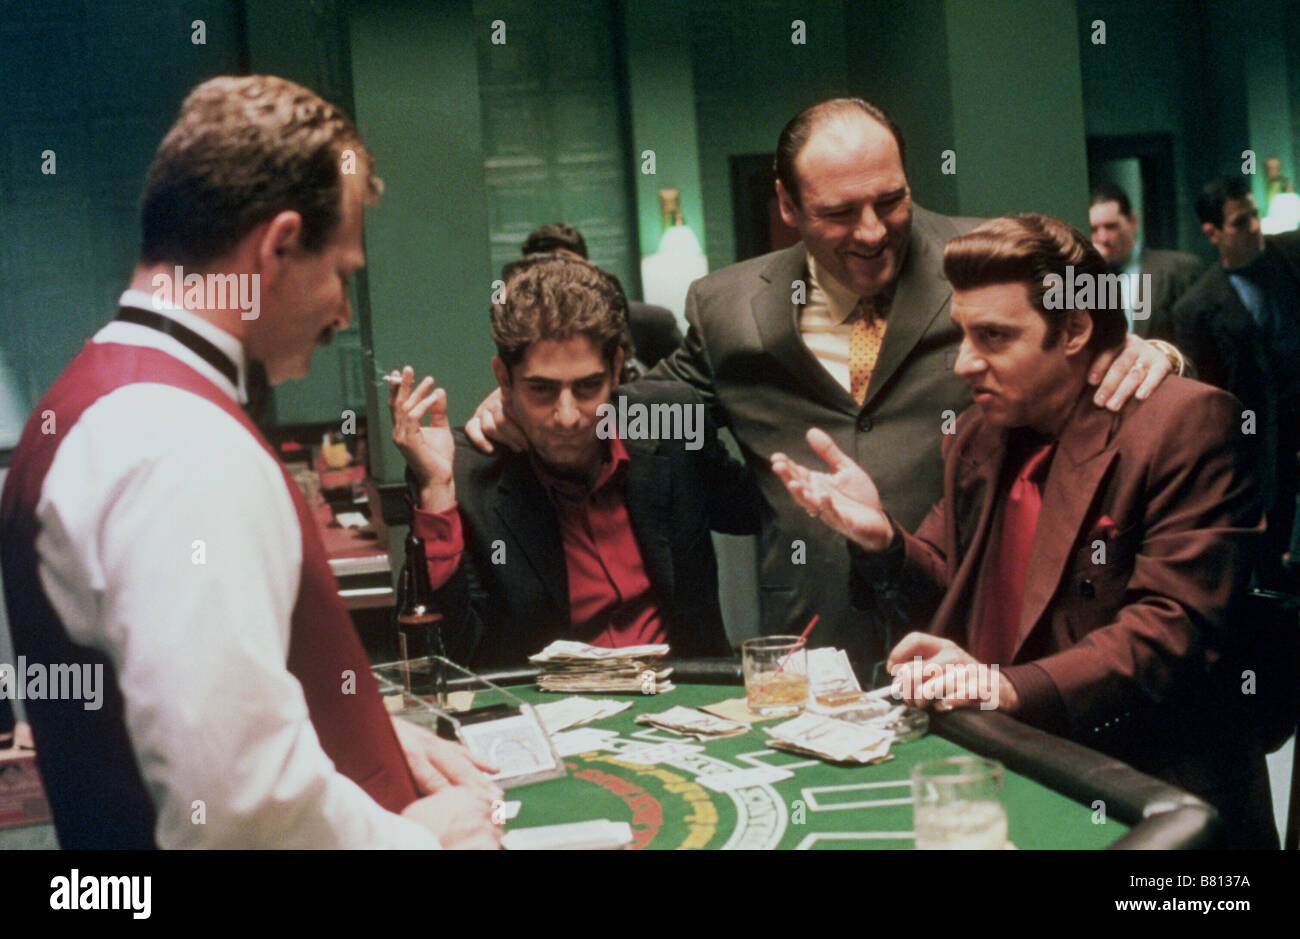 The Sopranos   TV-Series 1999-2007 USA 2004 Season 5  Created by David Chase Michael Imperioli, James Gandolfini, - Stock Image